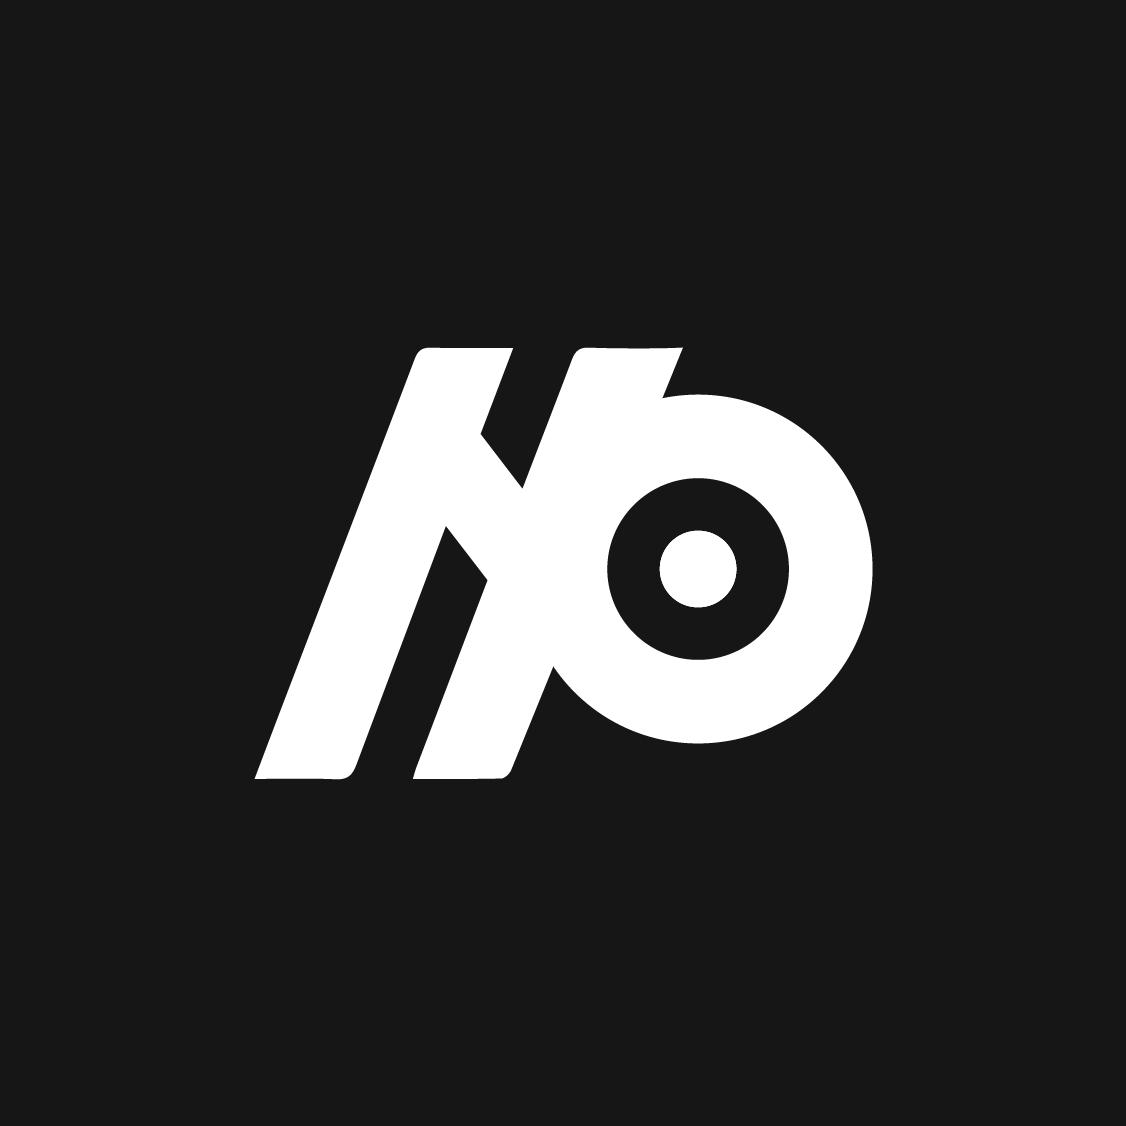 all-logos-2020-40